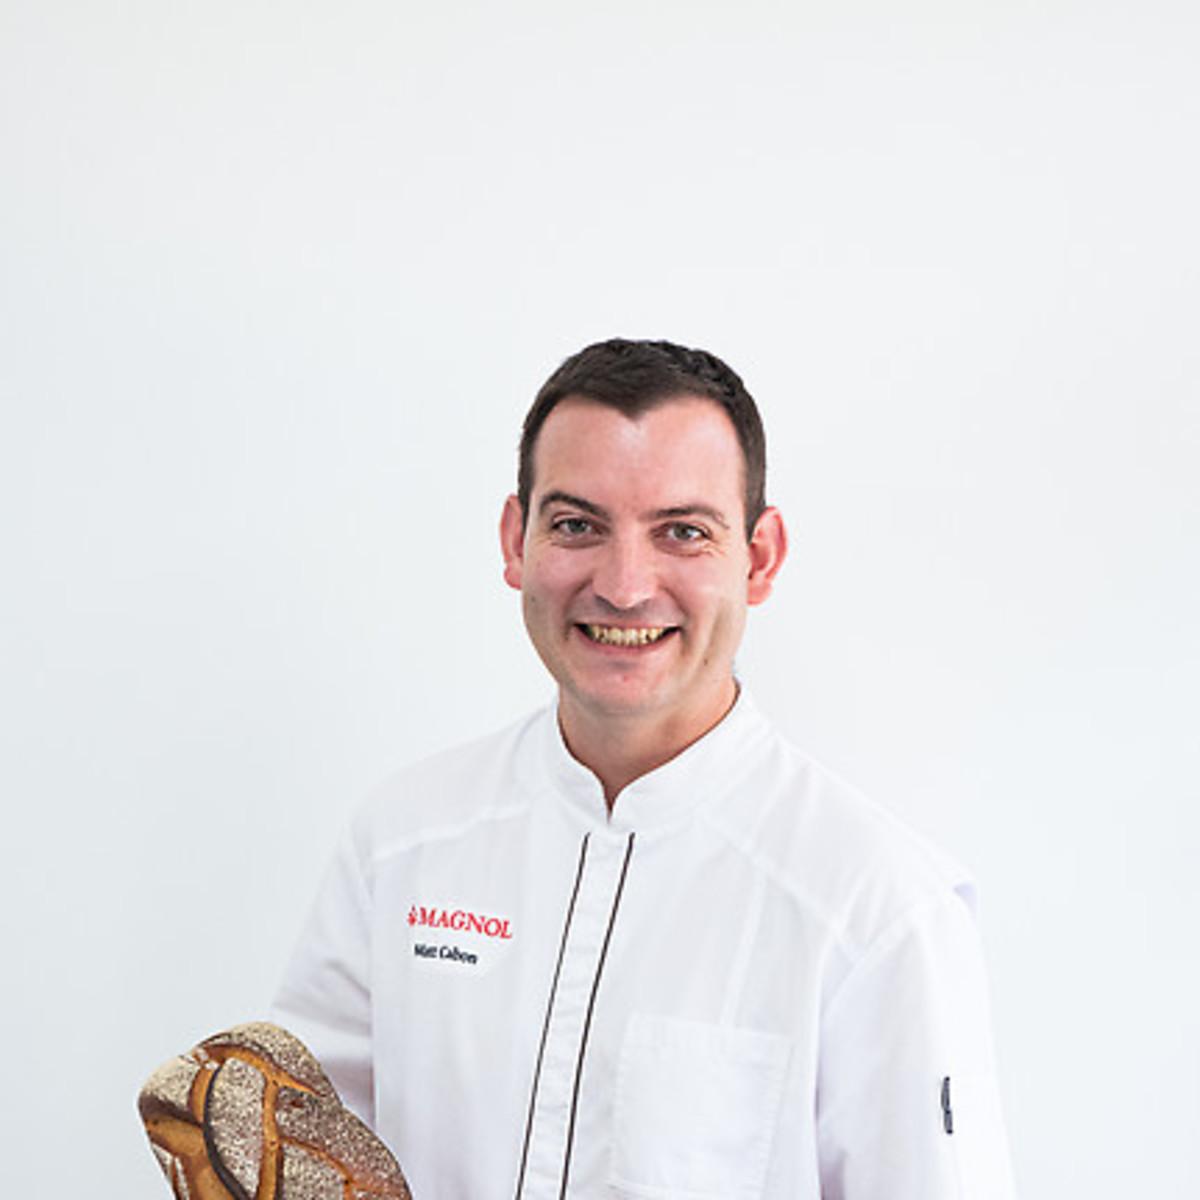 StarChefs Magnol French Baking Mathieu Cabon